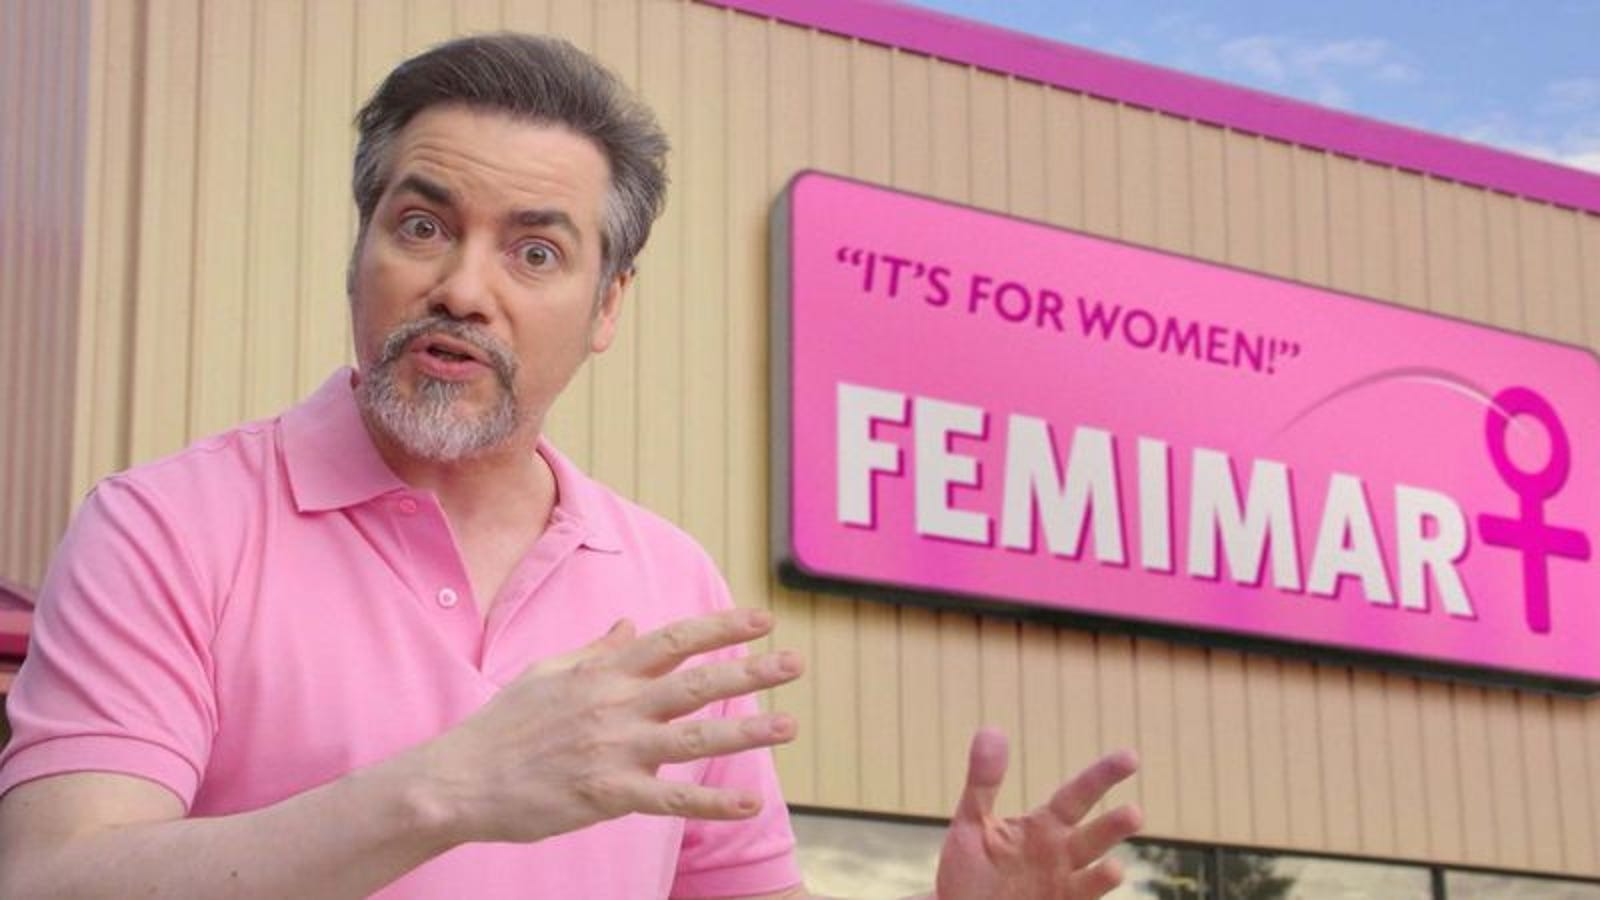 Portlandia opens a feminist superstore